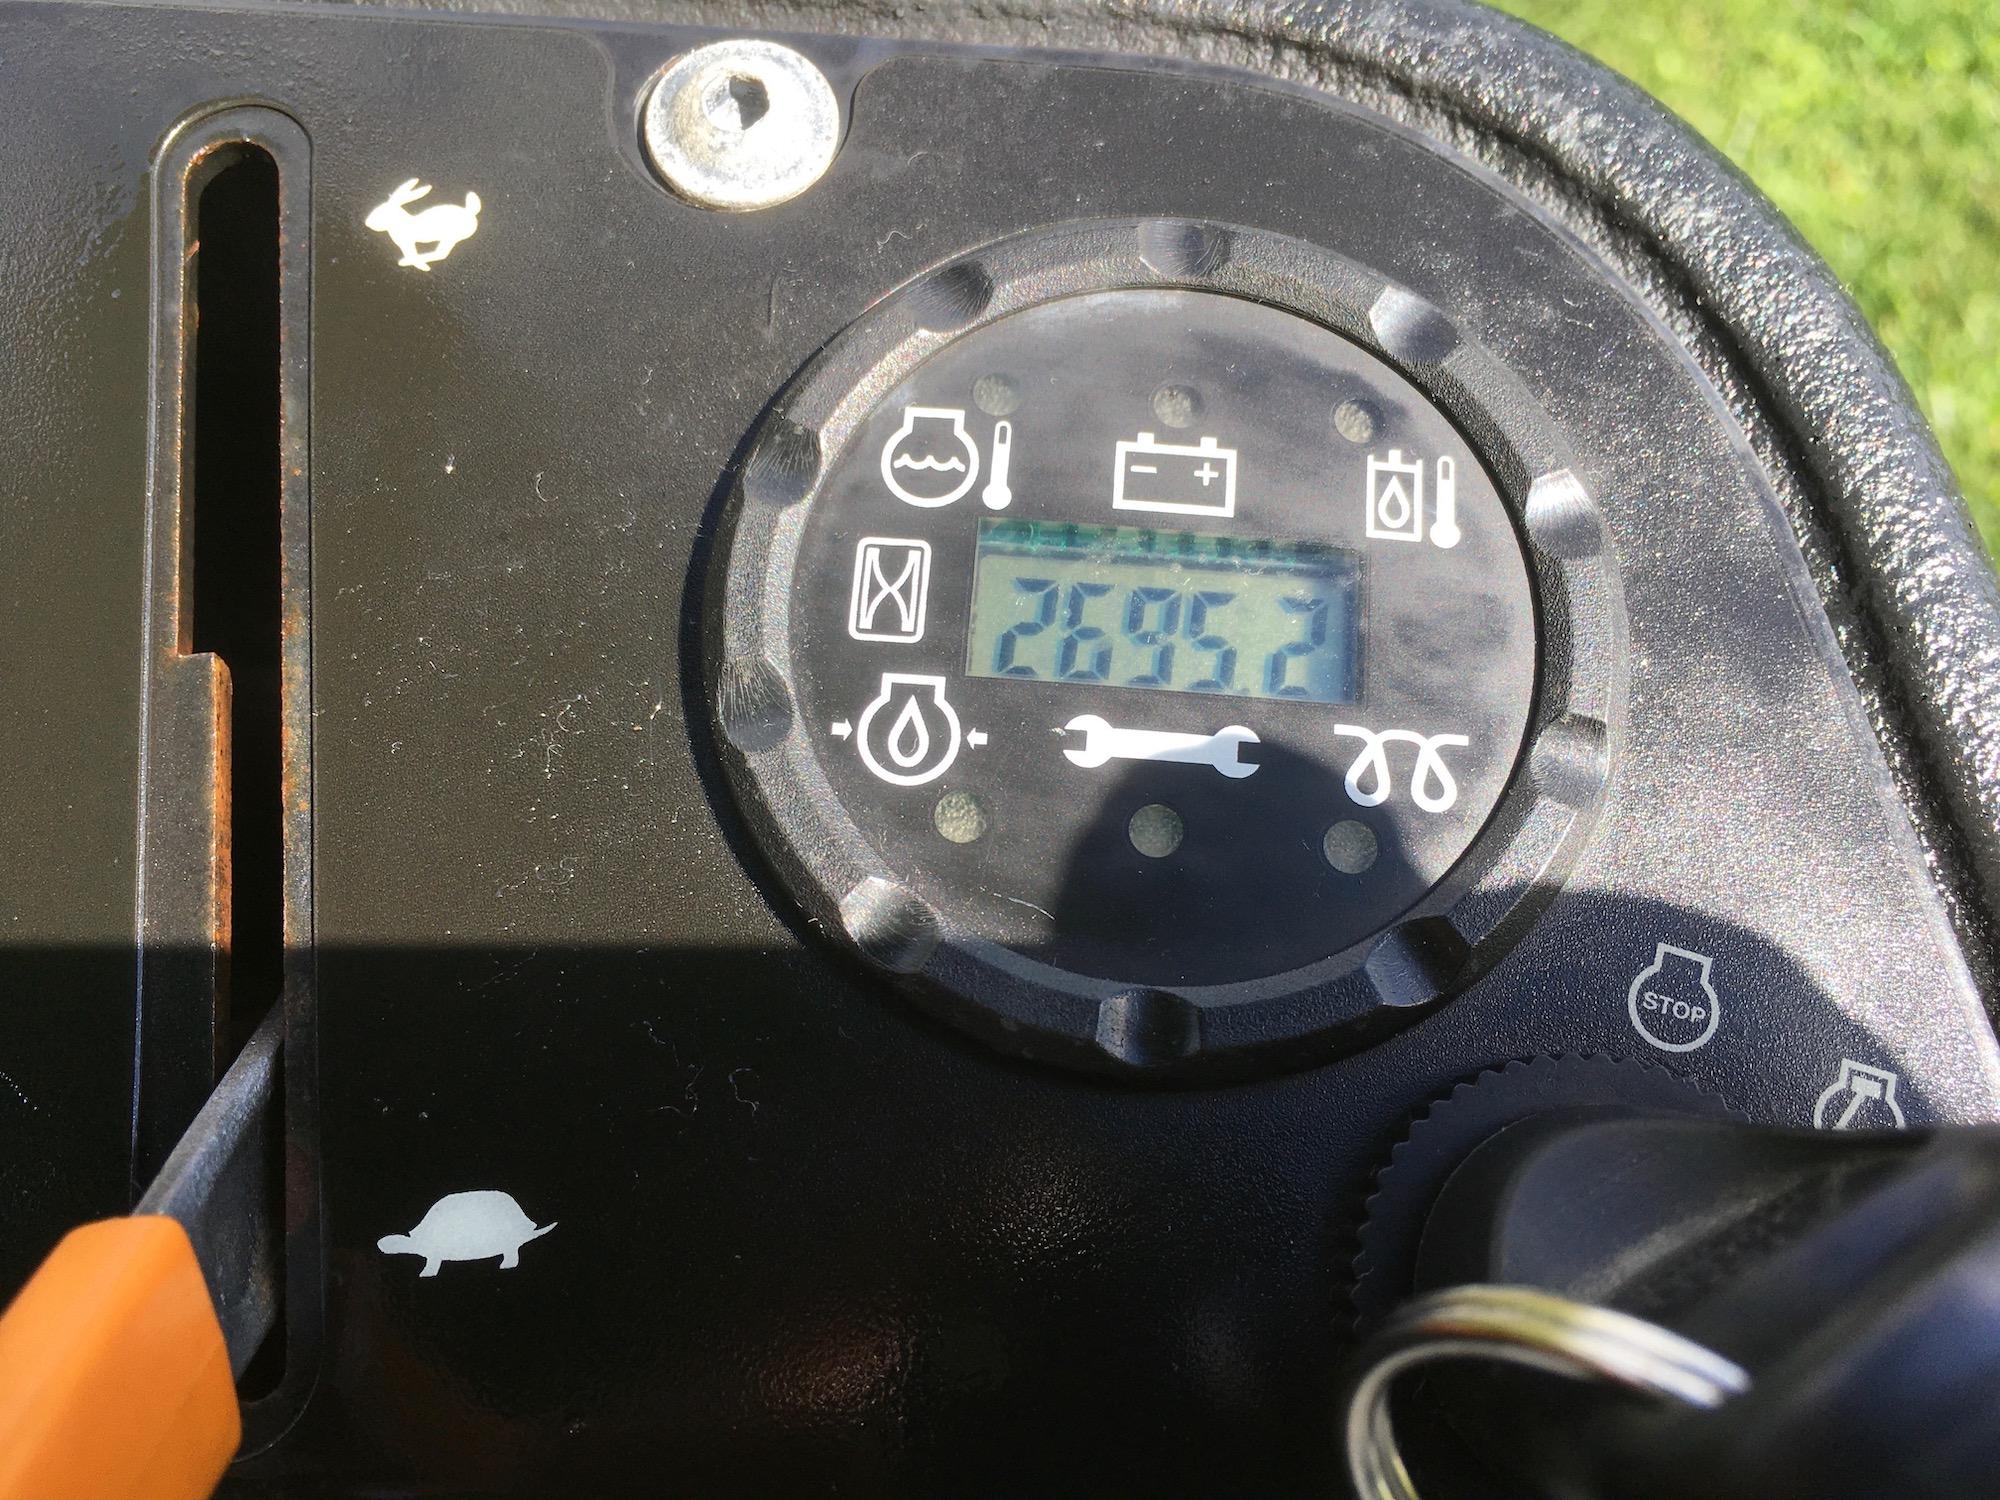 John-Deere-8800-Rough-Mower-05